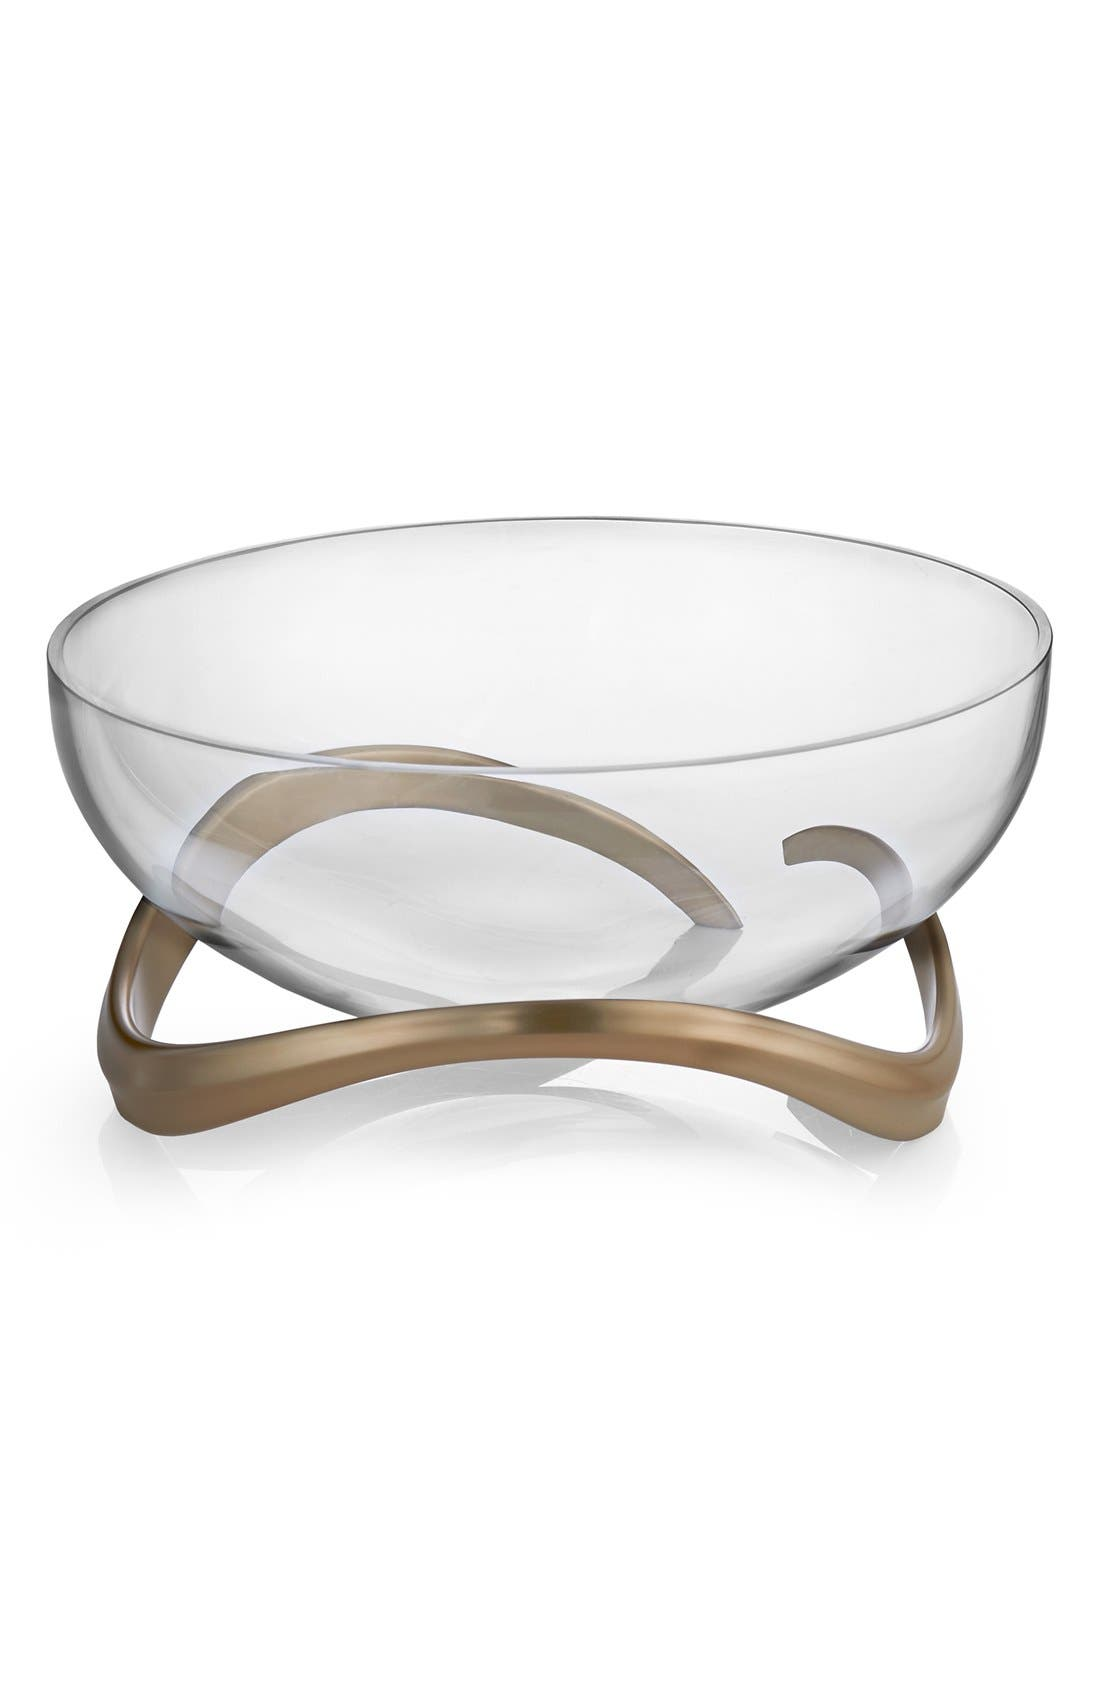 Main Image - Nambé 'Eco Collection' Glass Centerpiece Bowl